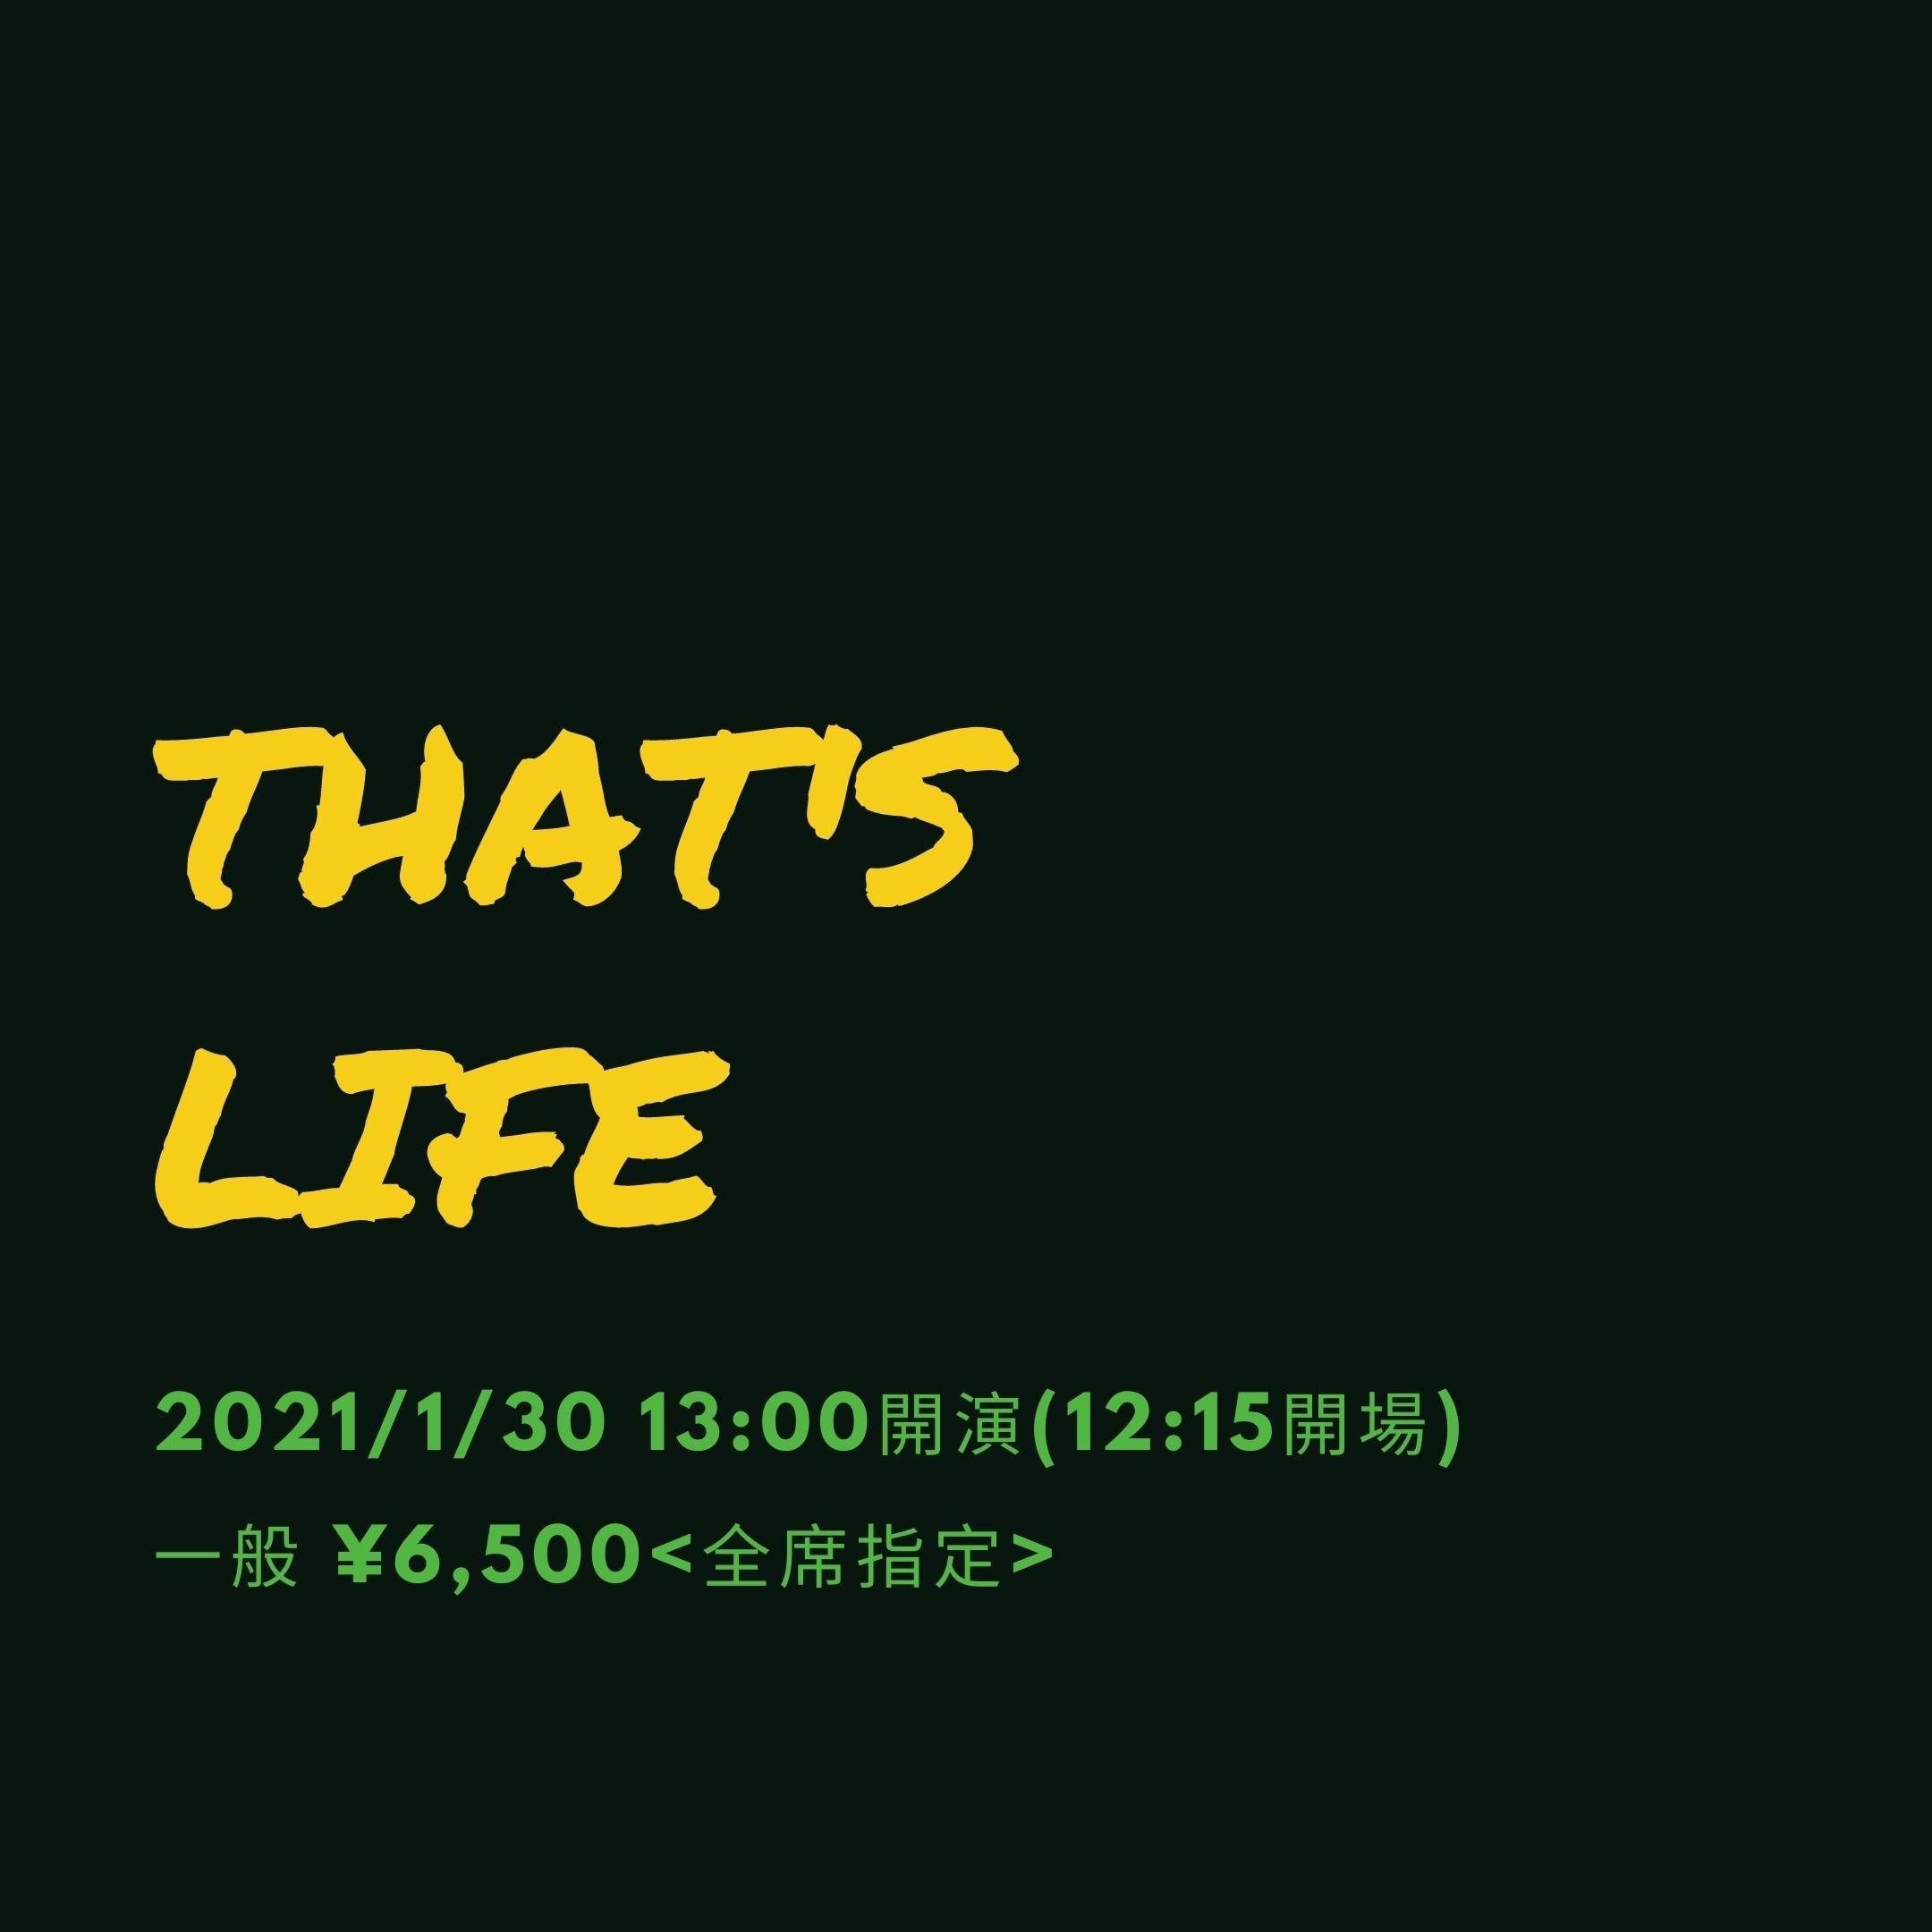 That's Life 一般チケット[①13:00開演回]のイメージその1